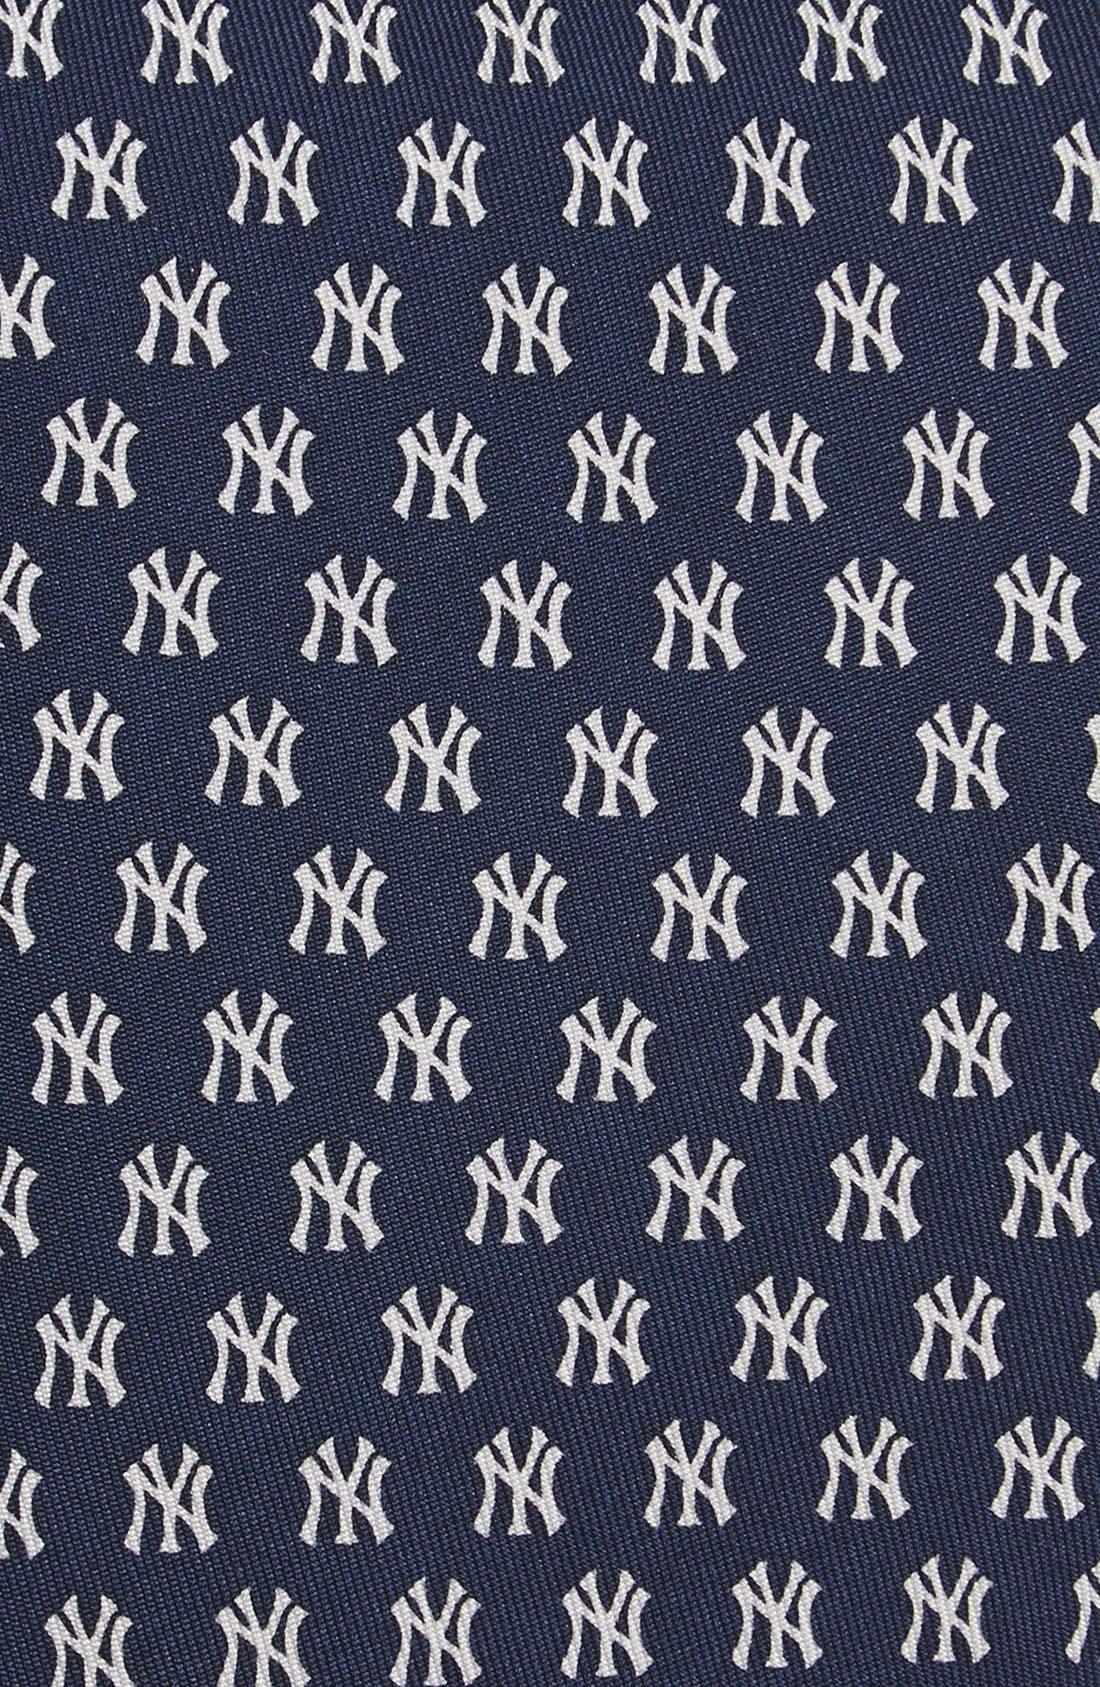 'New York Yankees' Silk Tie,                             Alternate thumbnail 2, color,                             414